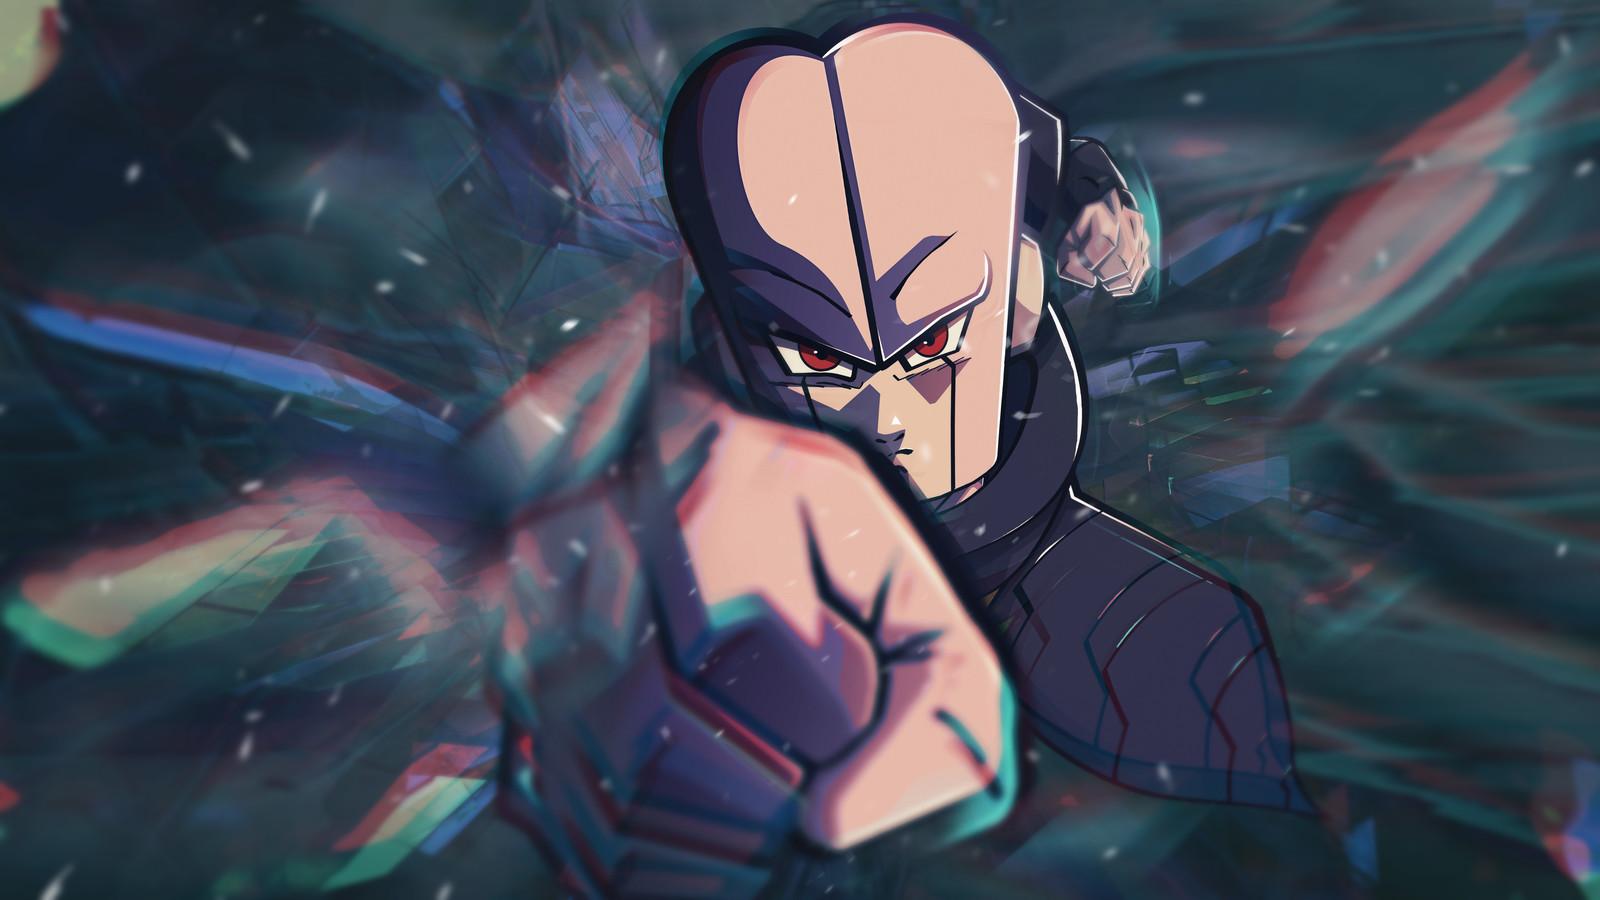 Artstation Hit Unerverse 6 Dragon Ball Super Jermaine Sepkitt